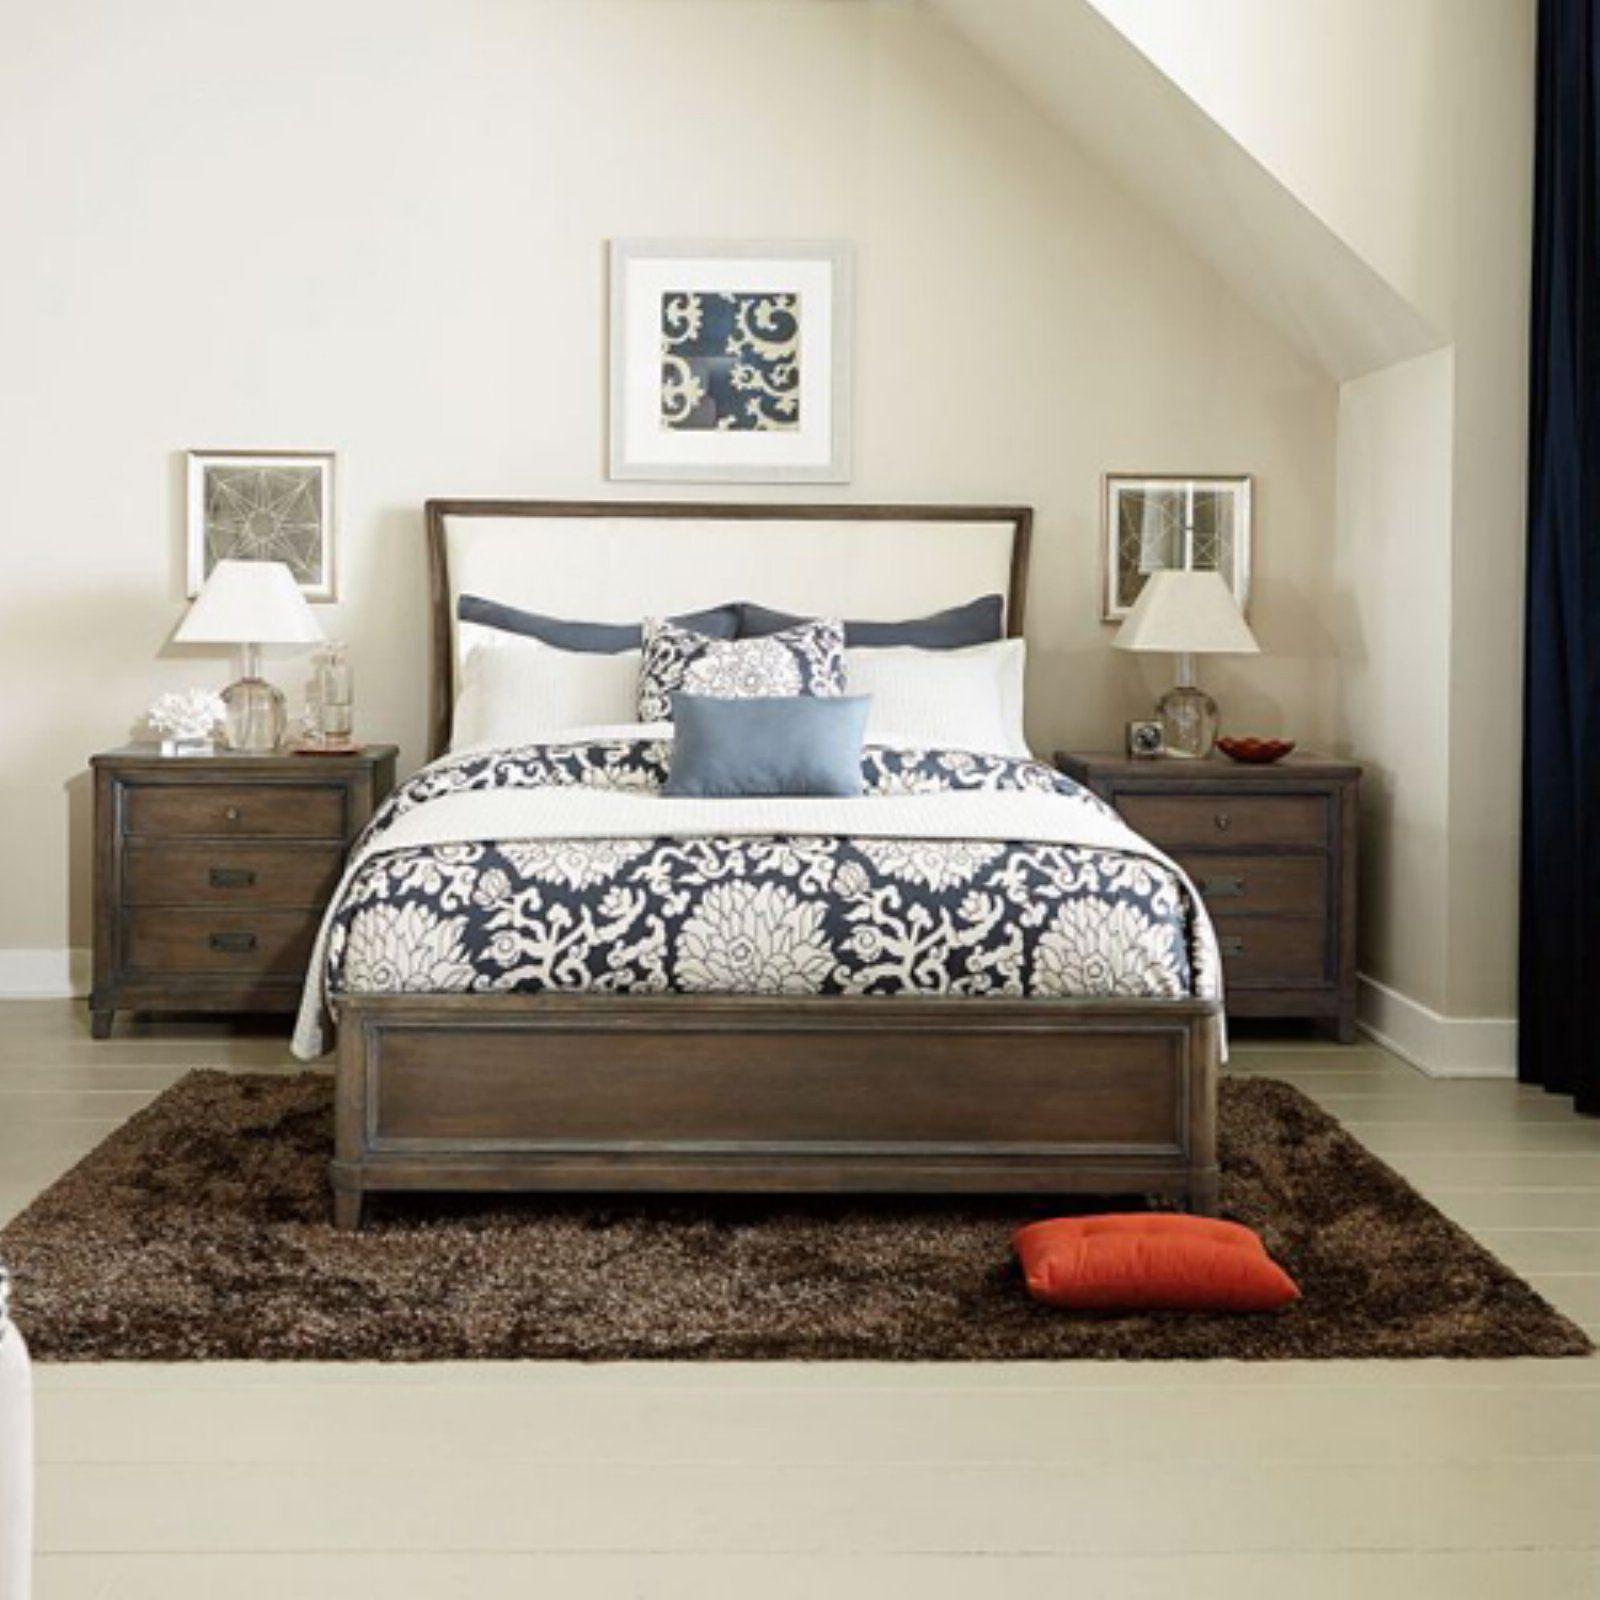 American Drew Park Studio Upholstered Sleigh Bed, Size